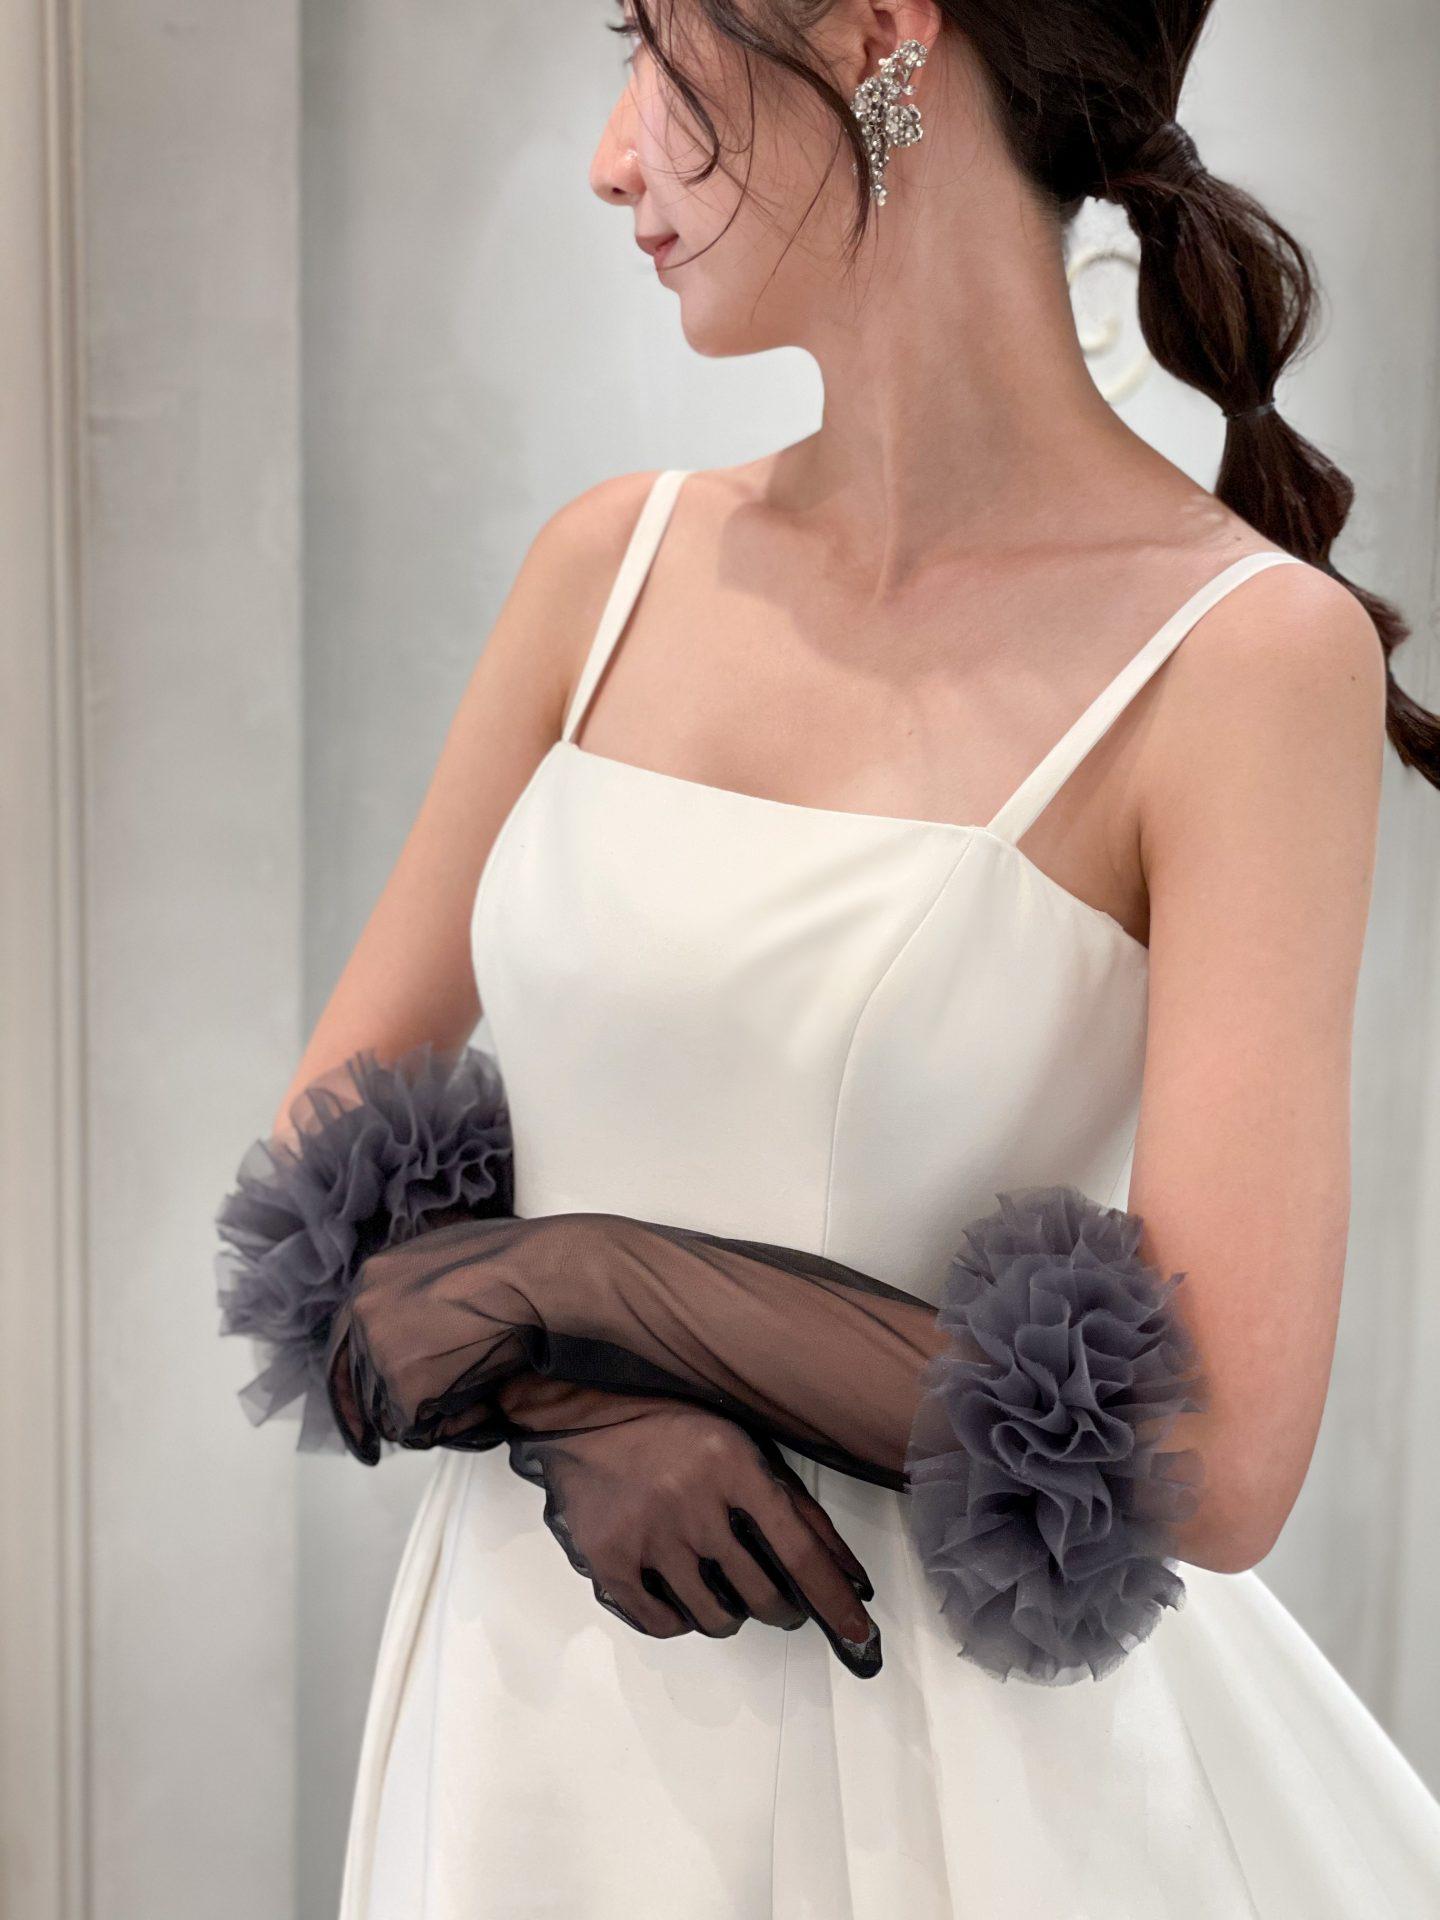 CALORINA HERRERAのシンプルなウェディングドレスに合わせるグローブはブラックカラーでモードな印象に